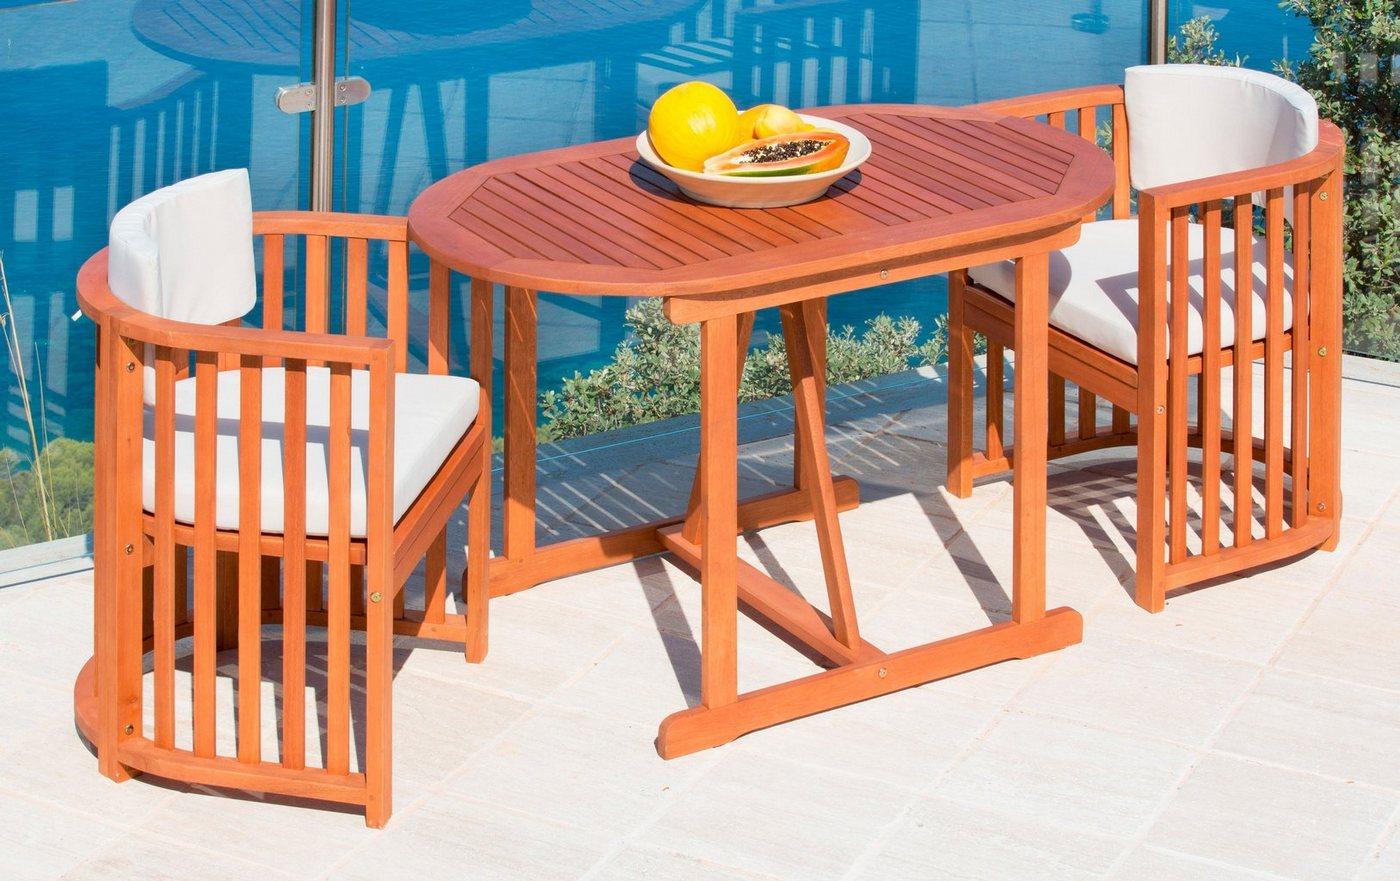 Tuinmeubelset Brazilië, 2 stoelen en 1 tafel 120x70 cm, eucalyptushout